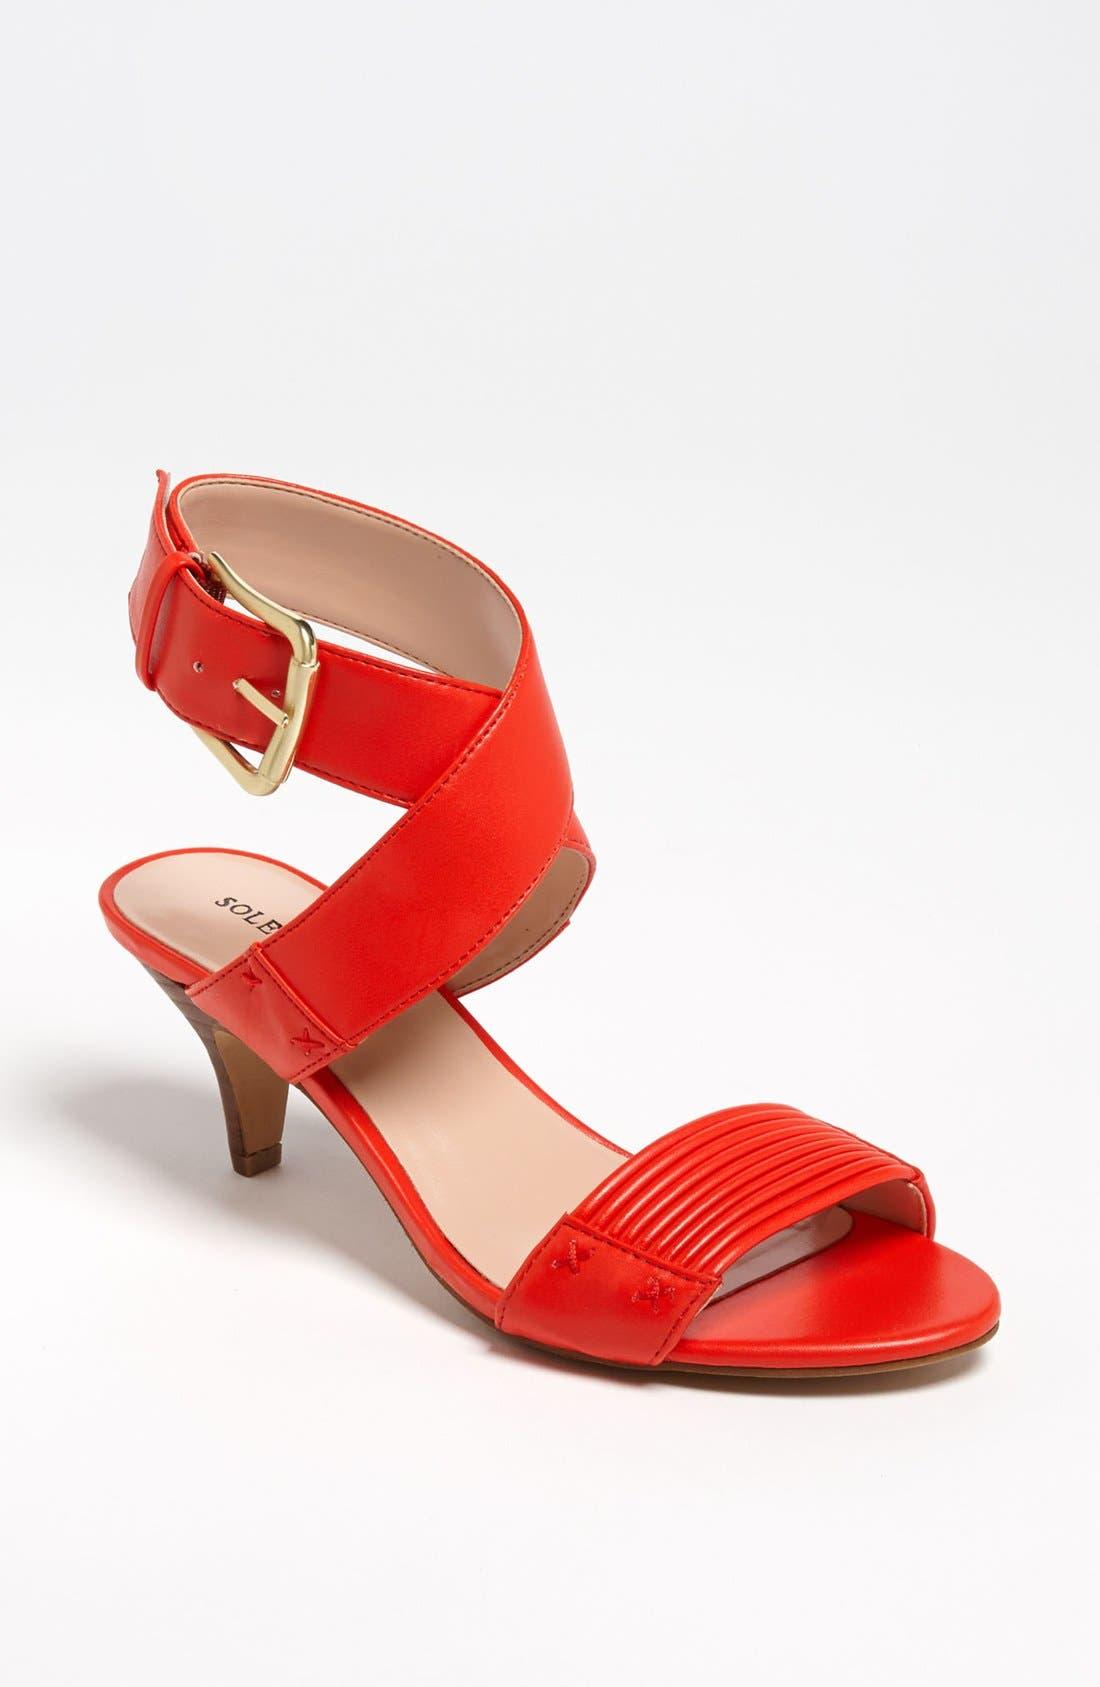 Alternate Image 1 Selected - Sole Society 'Penelope' Sandal